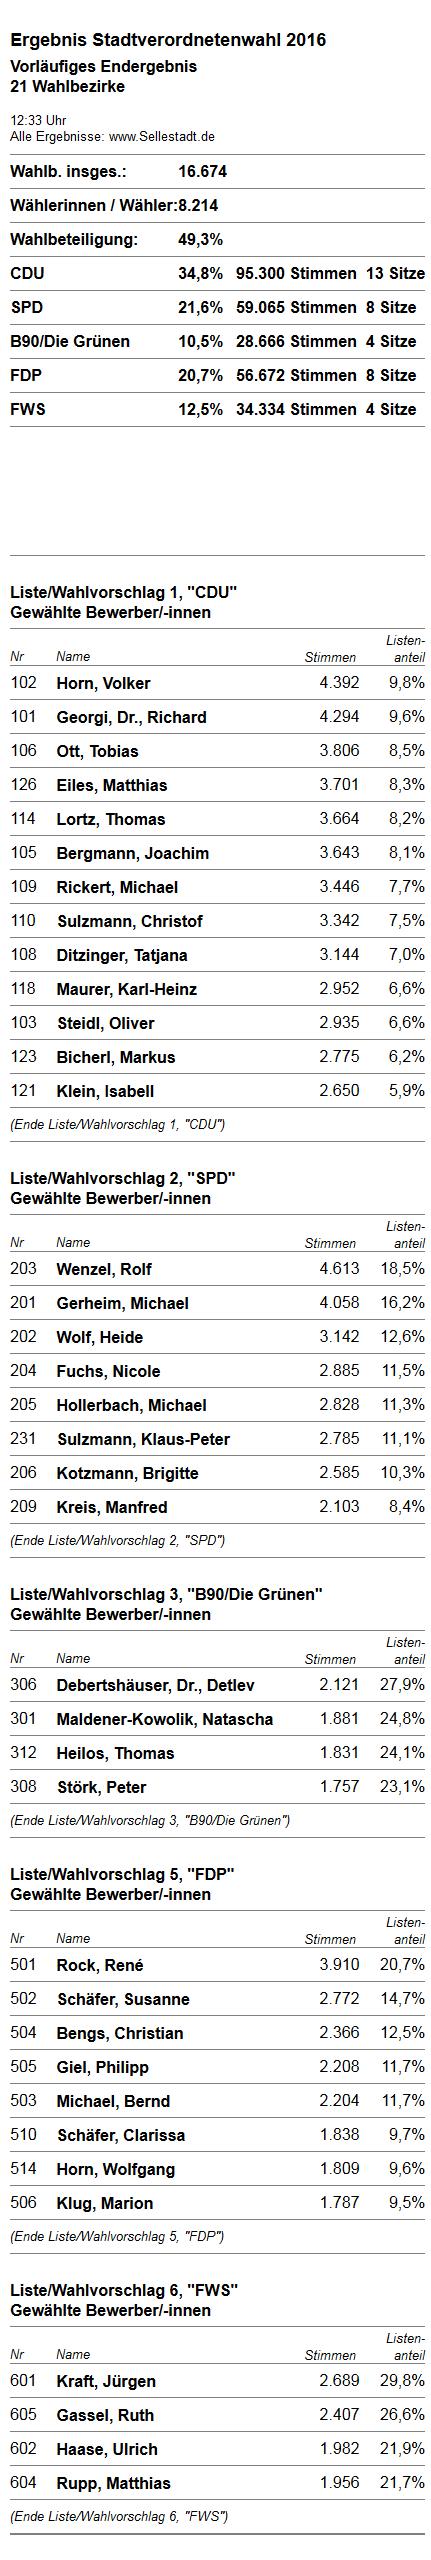 Kommunalwahl Seligenstadt 2016 vorl. Endergebnis